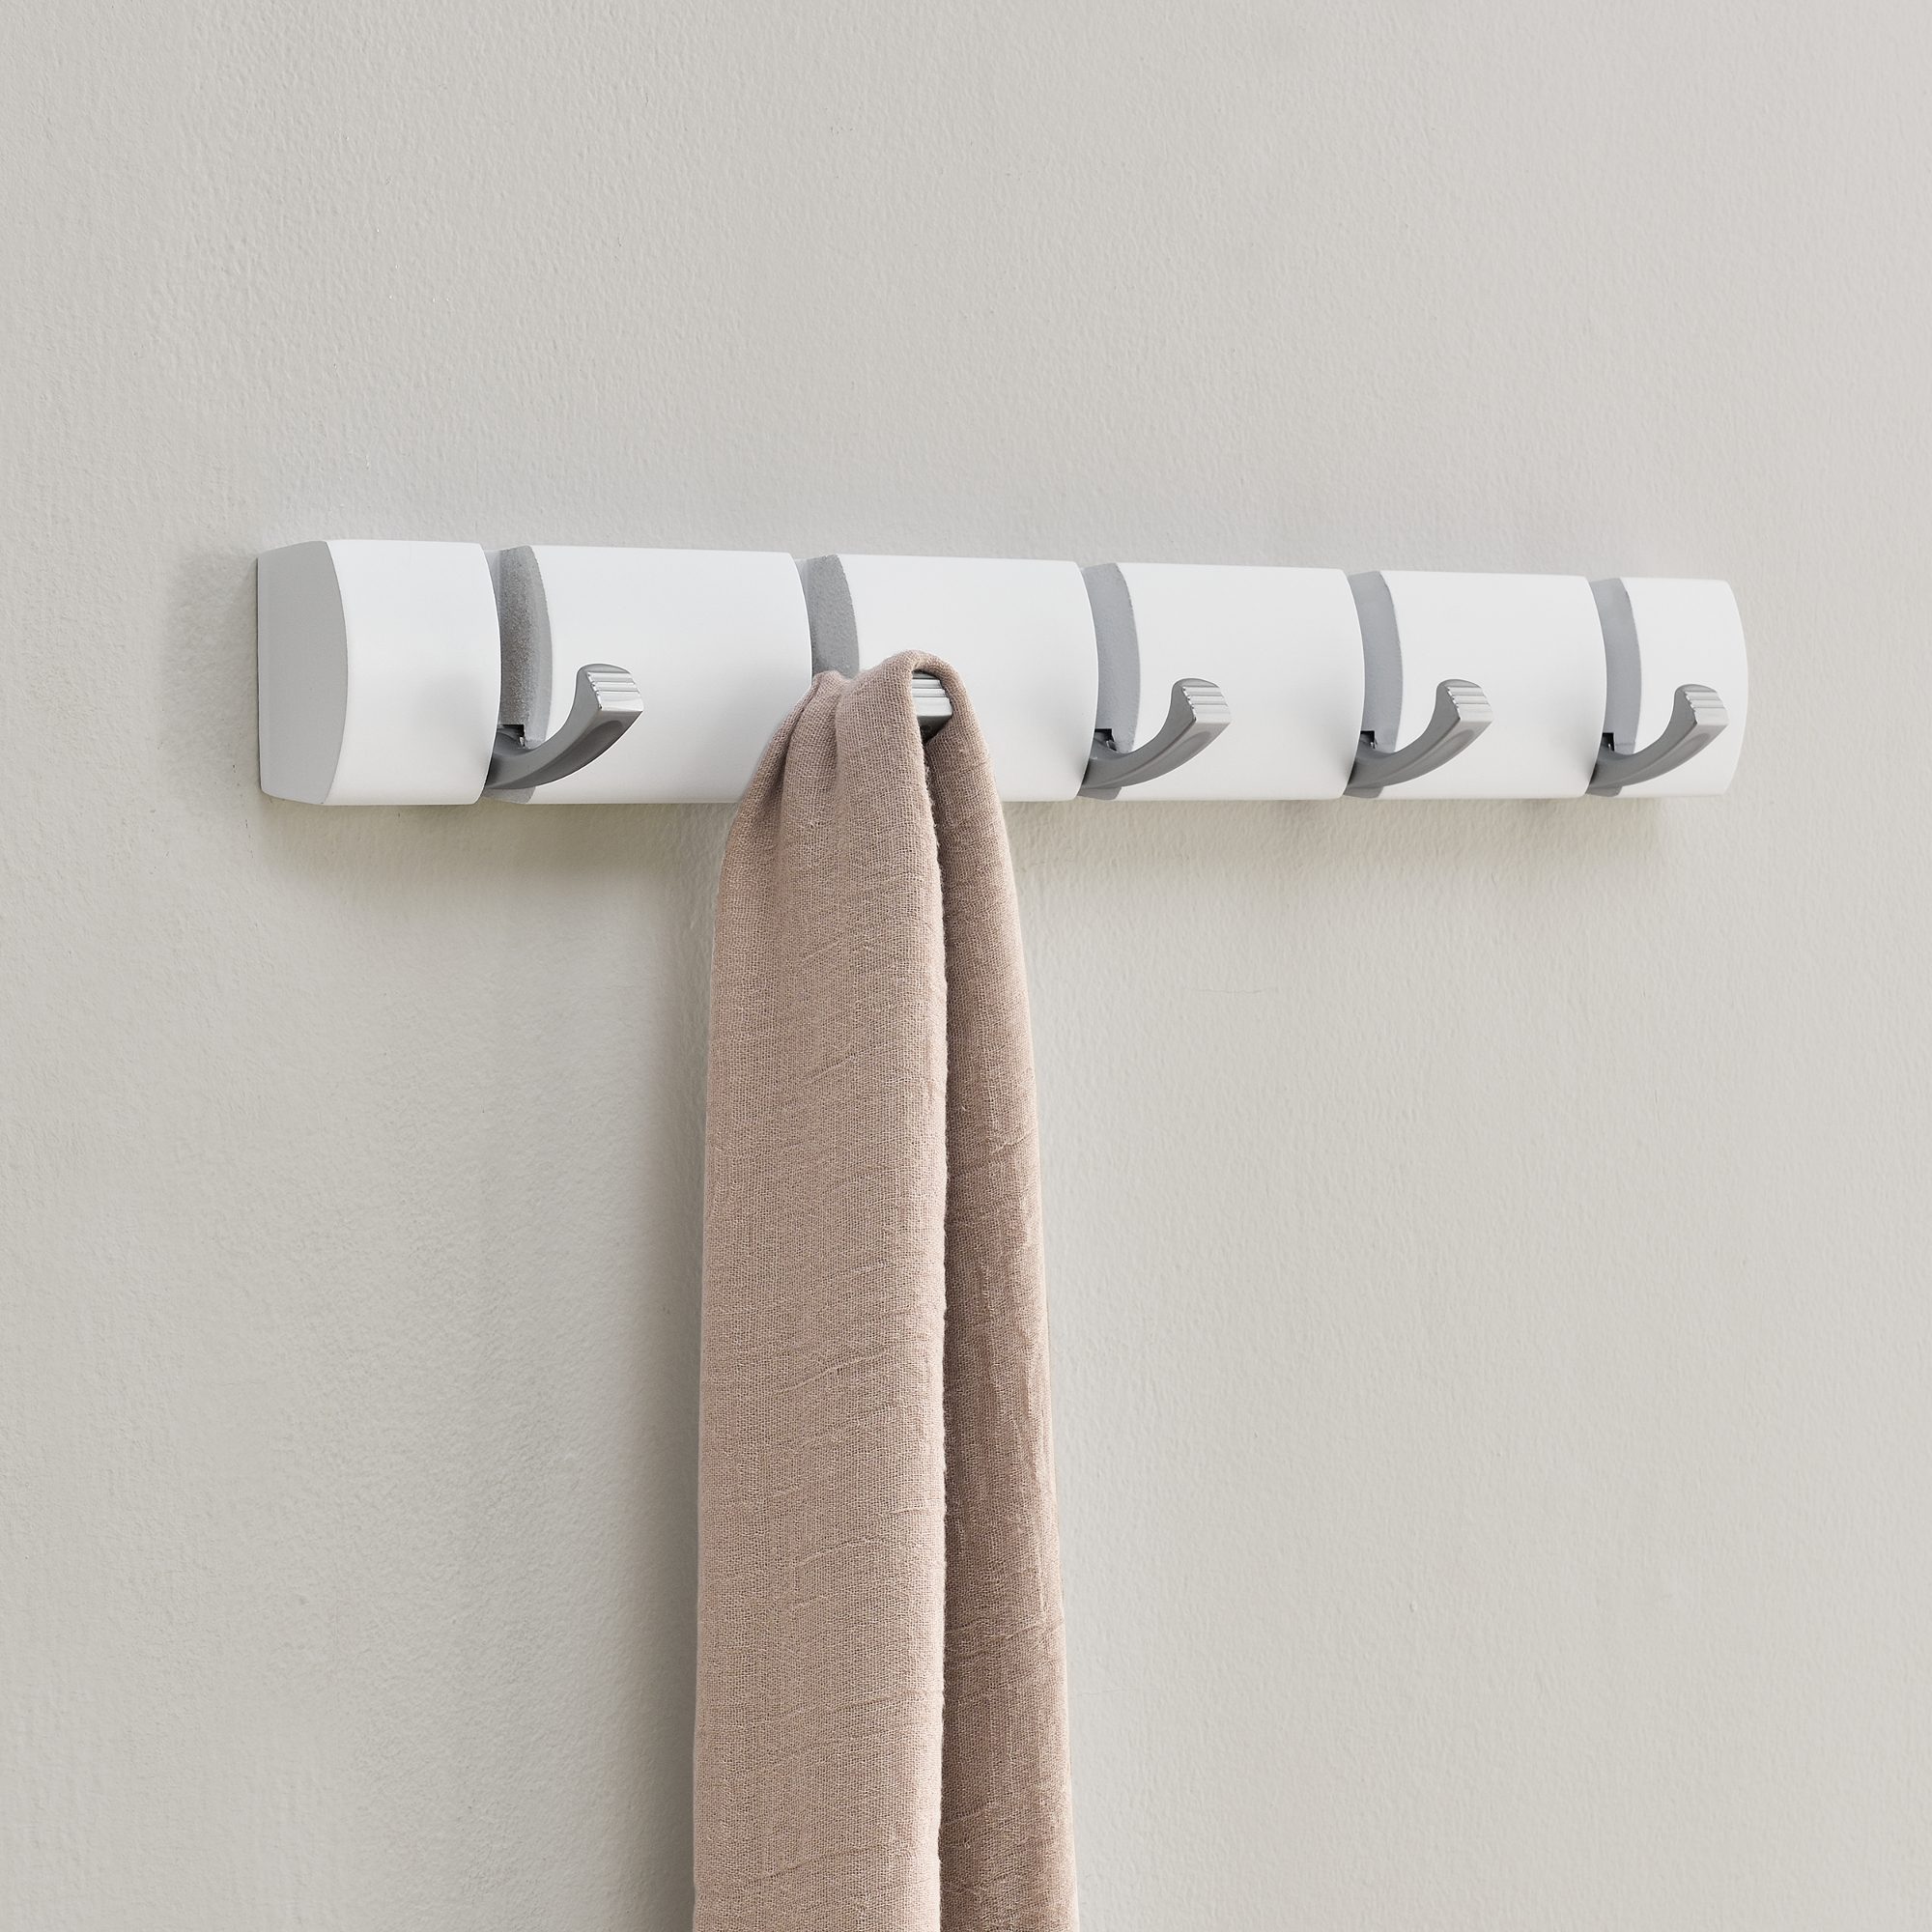 garderobe klapphaken kleiderhaken wandgarderobe. Black Bedroom Furniture Sets. Home Design Ideas